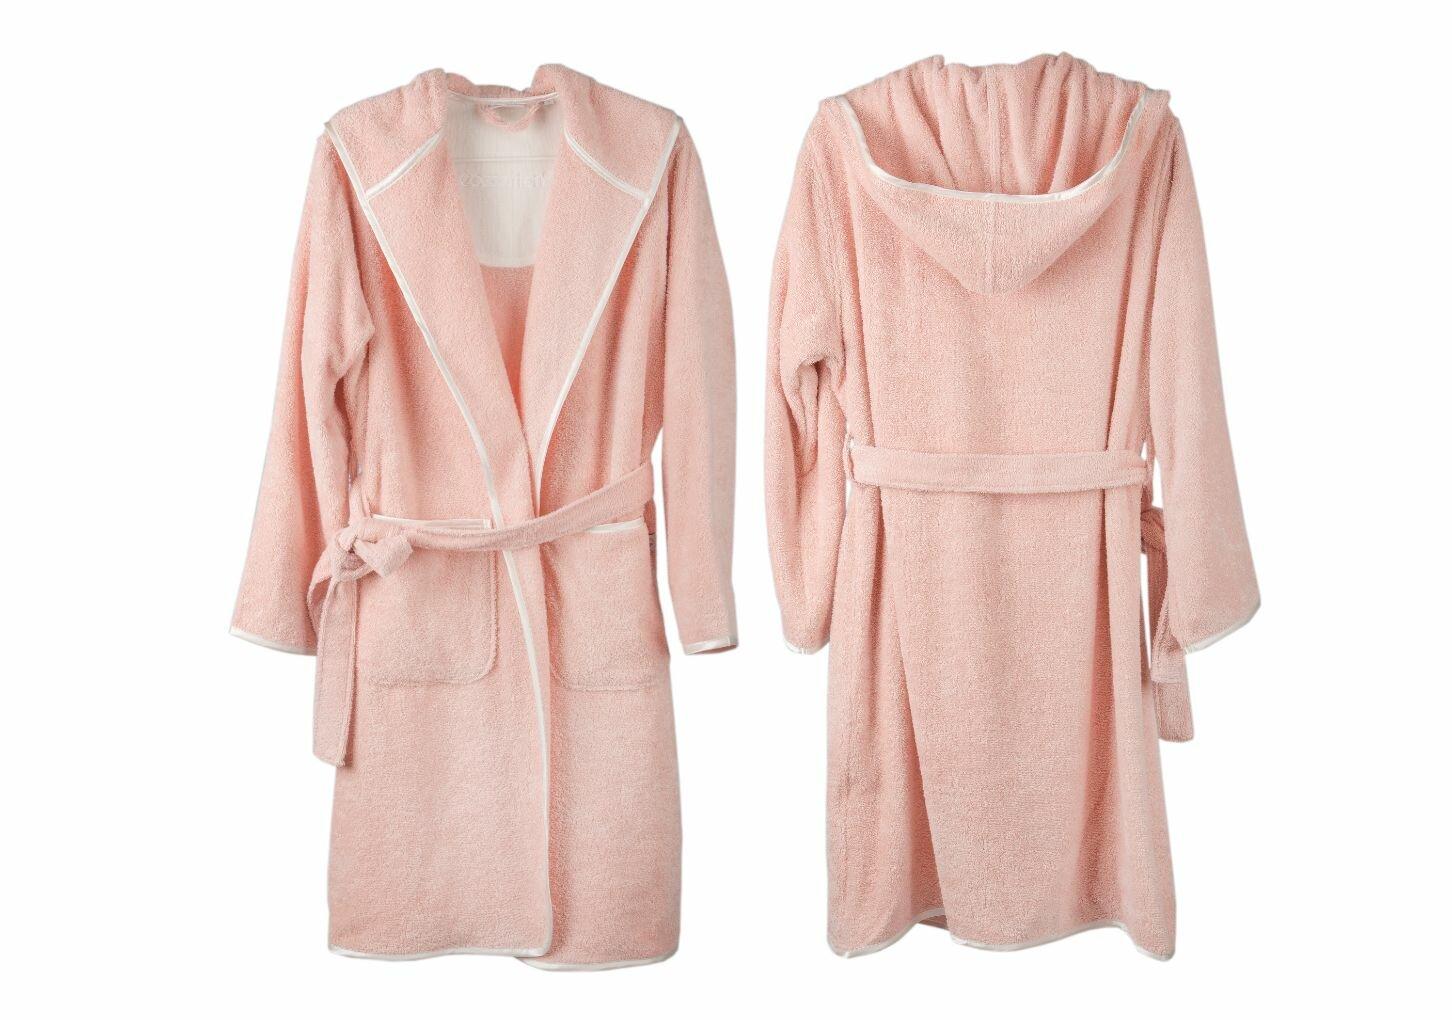 Cotton & Olive Organic Cotton Dressing Gown | Wayfair.co.uk